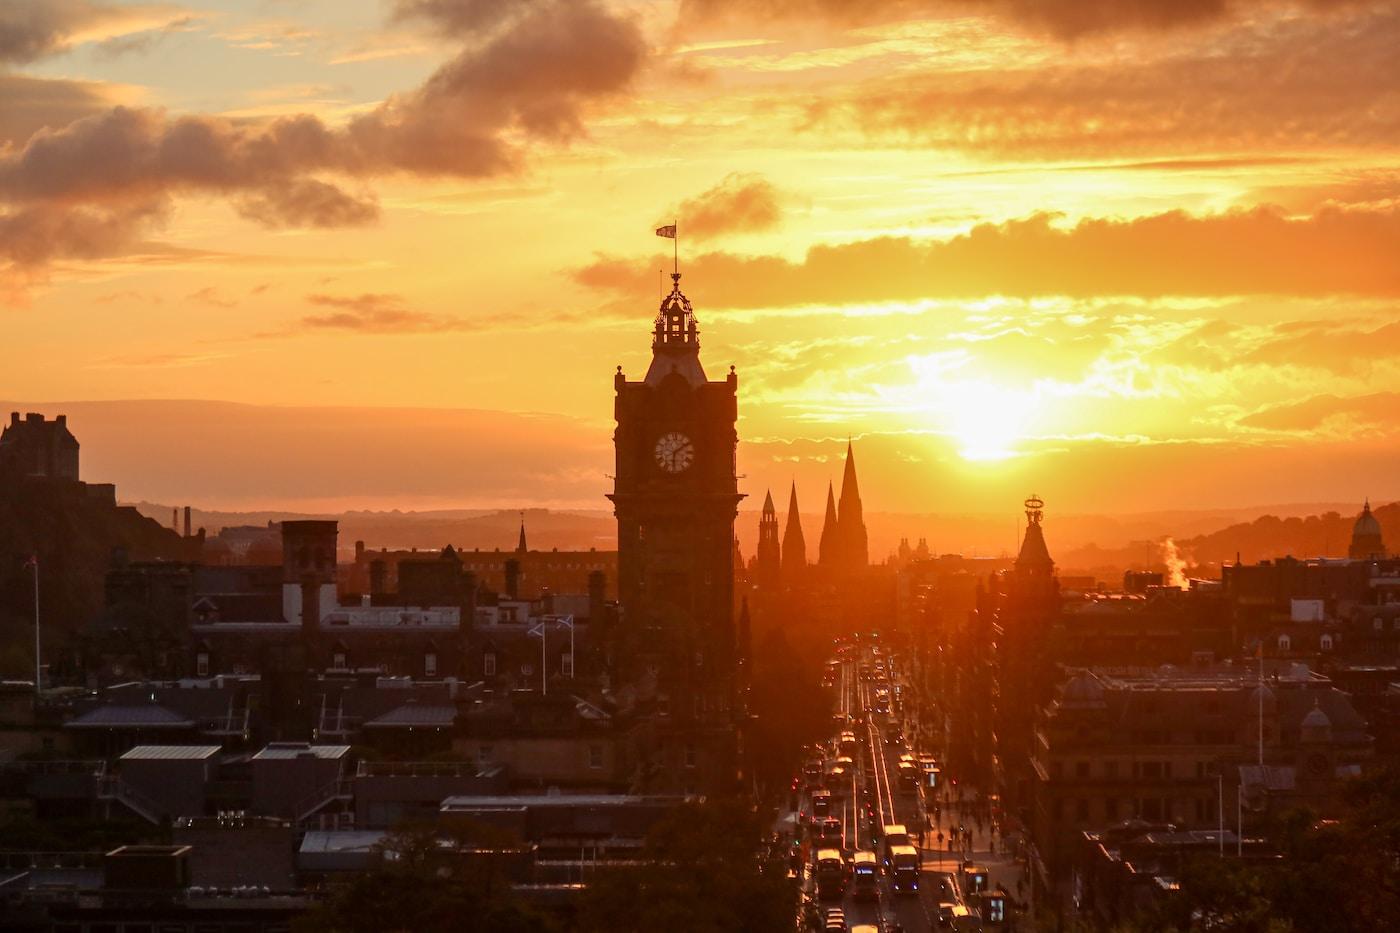 Universities Scotland. brown concrete building during sunset